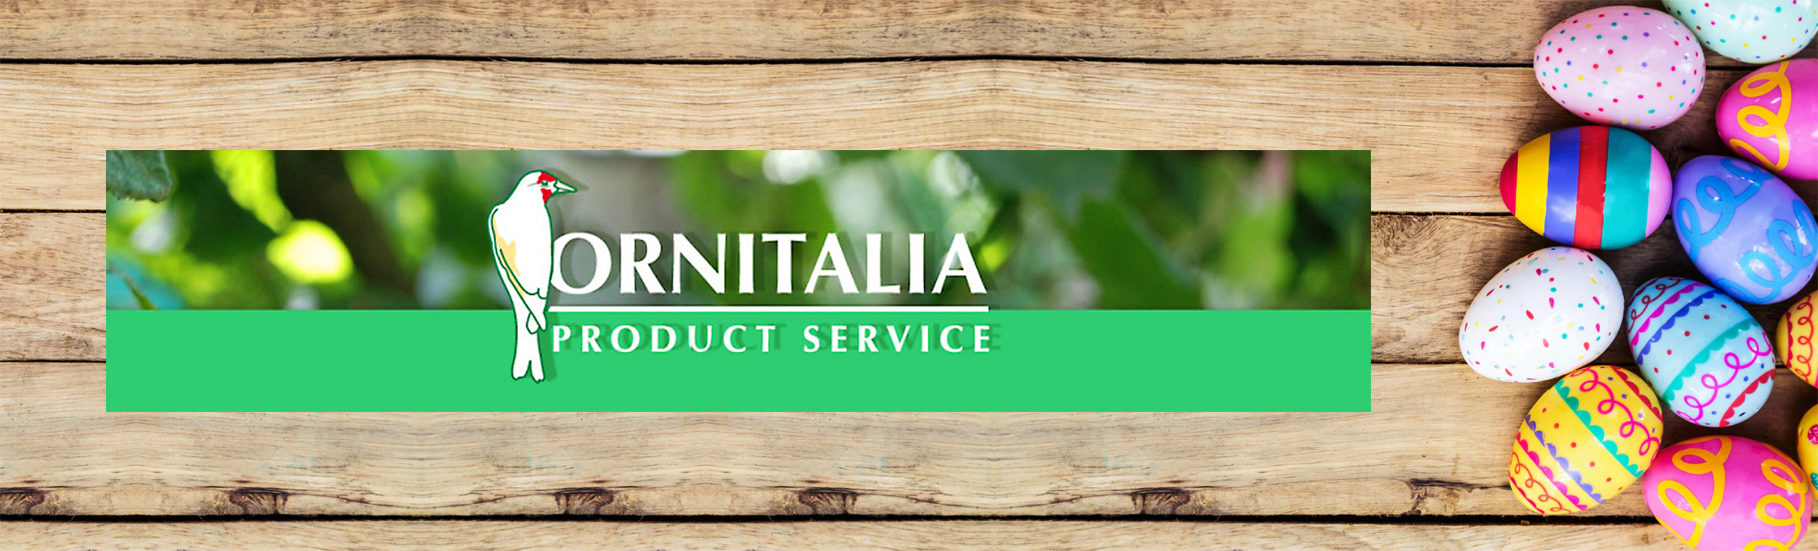 Ornitalia Product Service